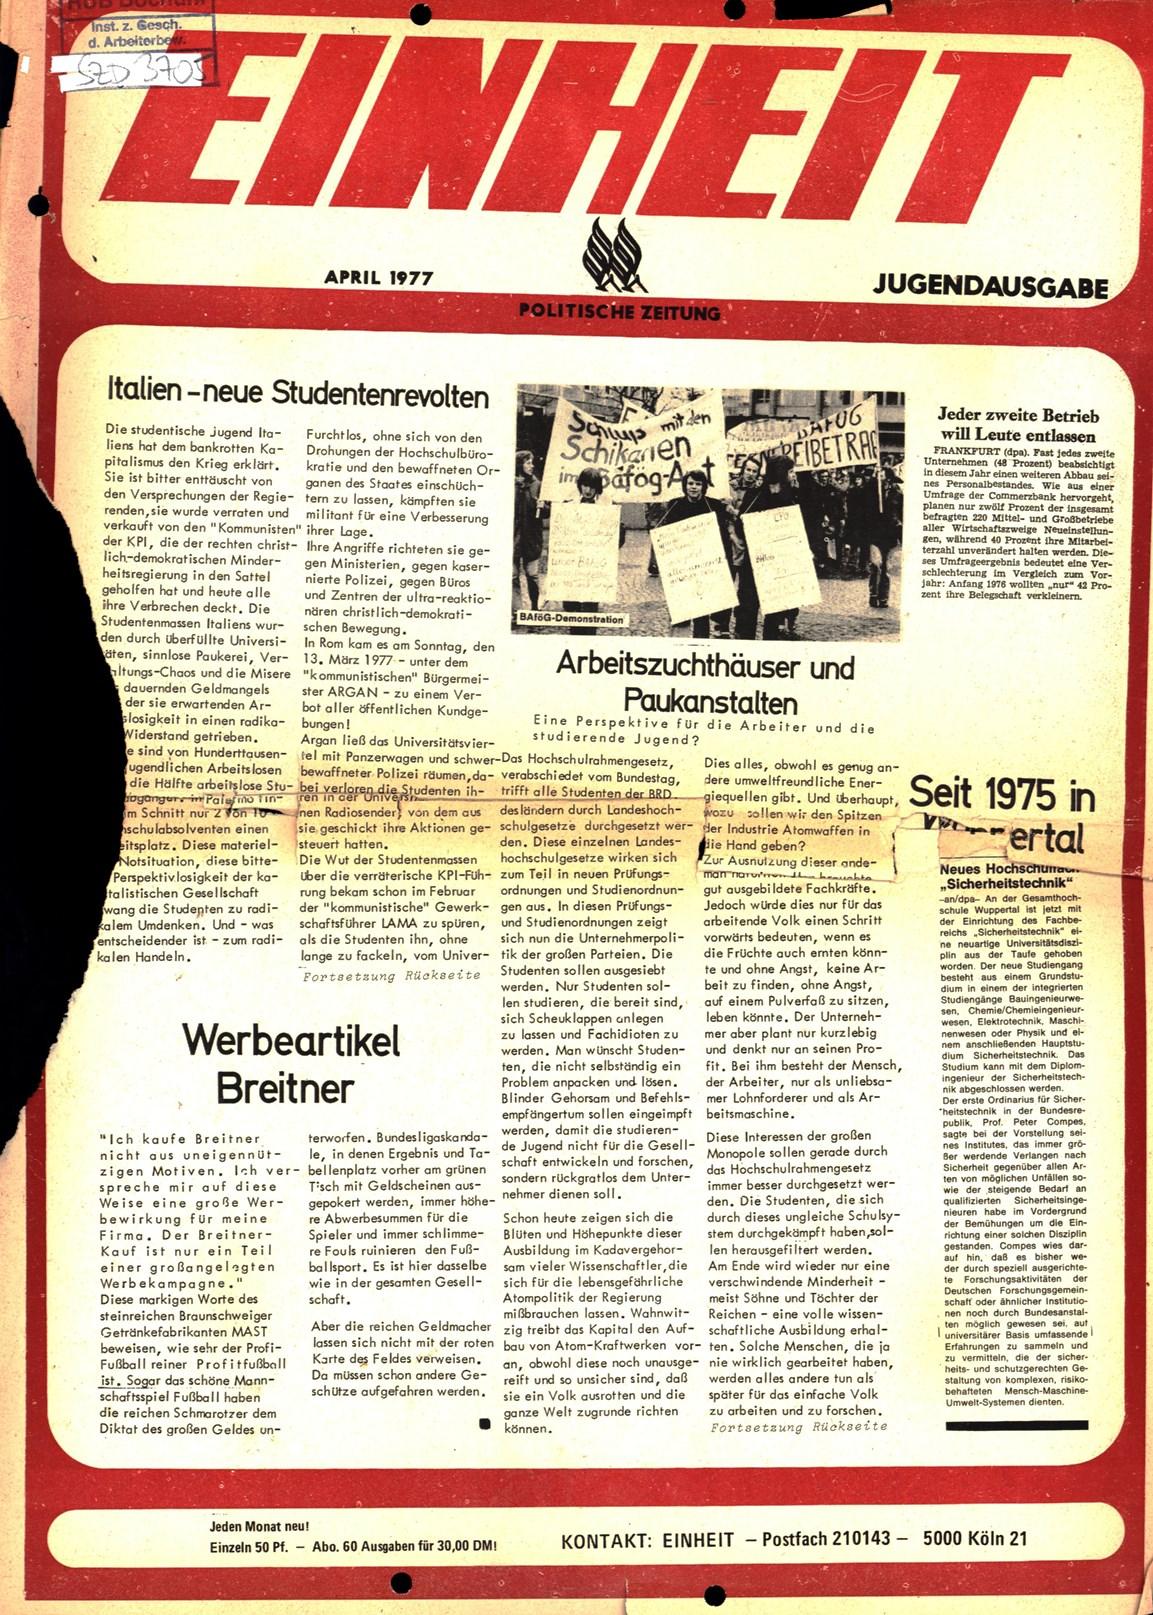 Koeln_IPdA_Einheit_1977_013_Jugend_001